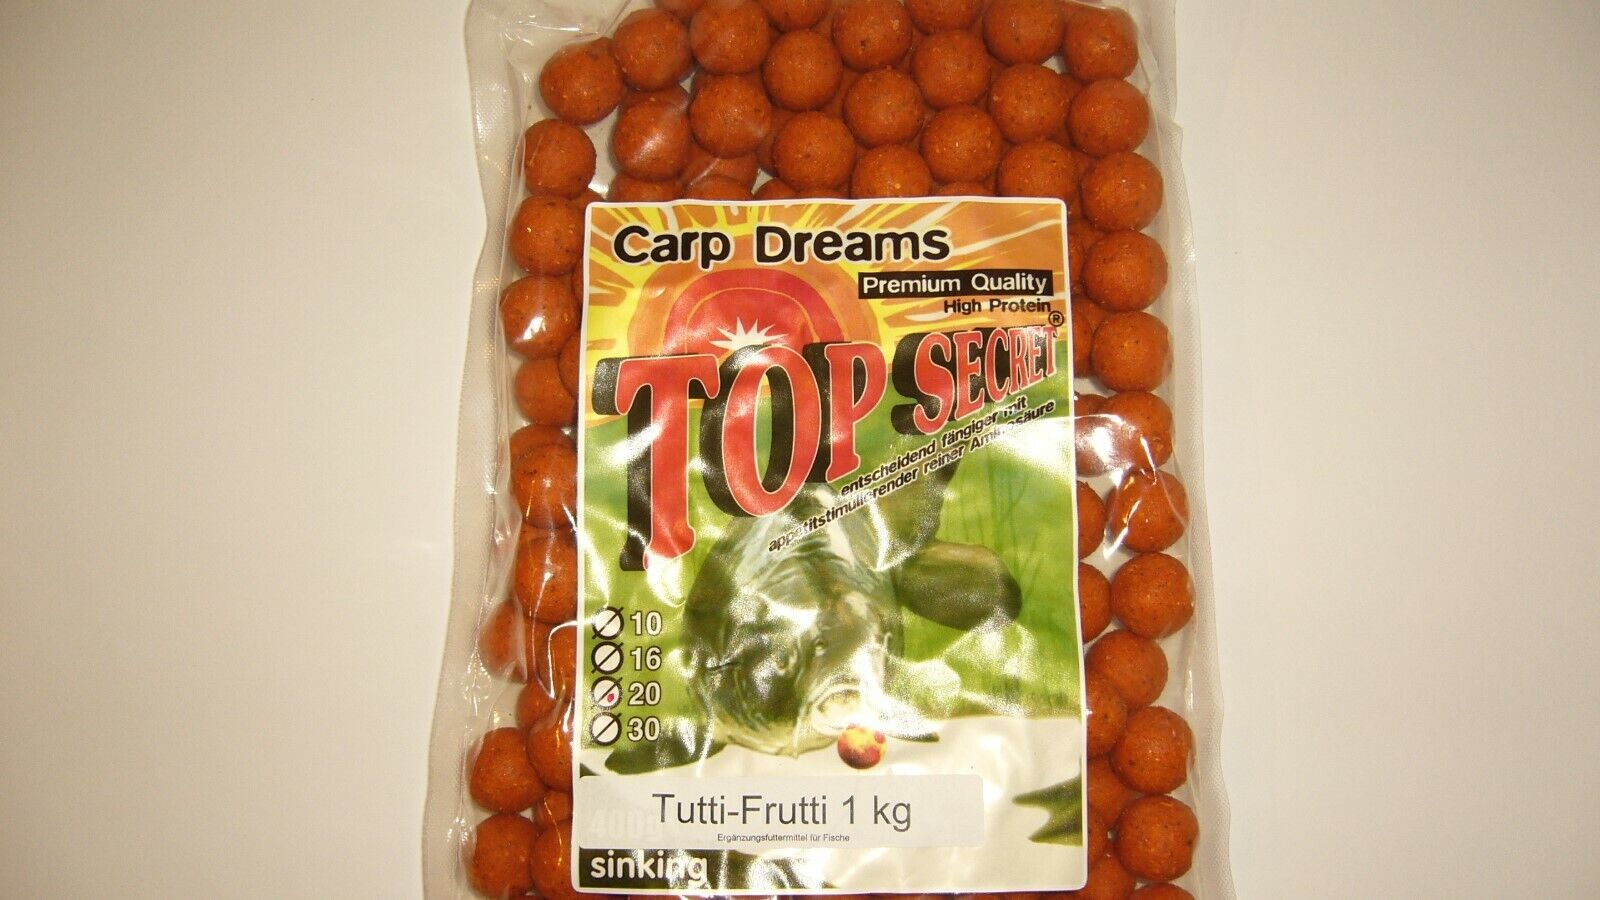 Boilies, Karpfen, Verschiedene Sorten, 1Kg, 20mm, Angeln, Top Secret